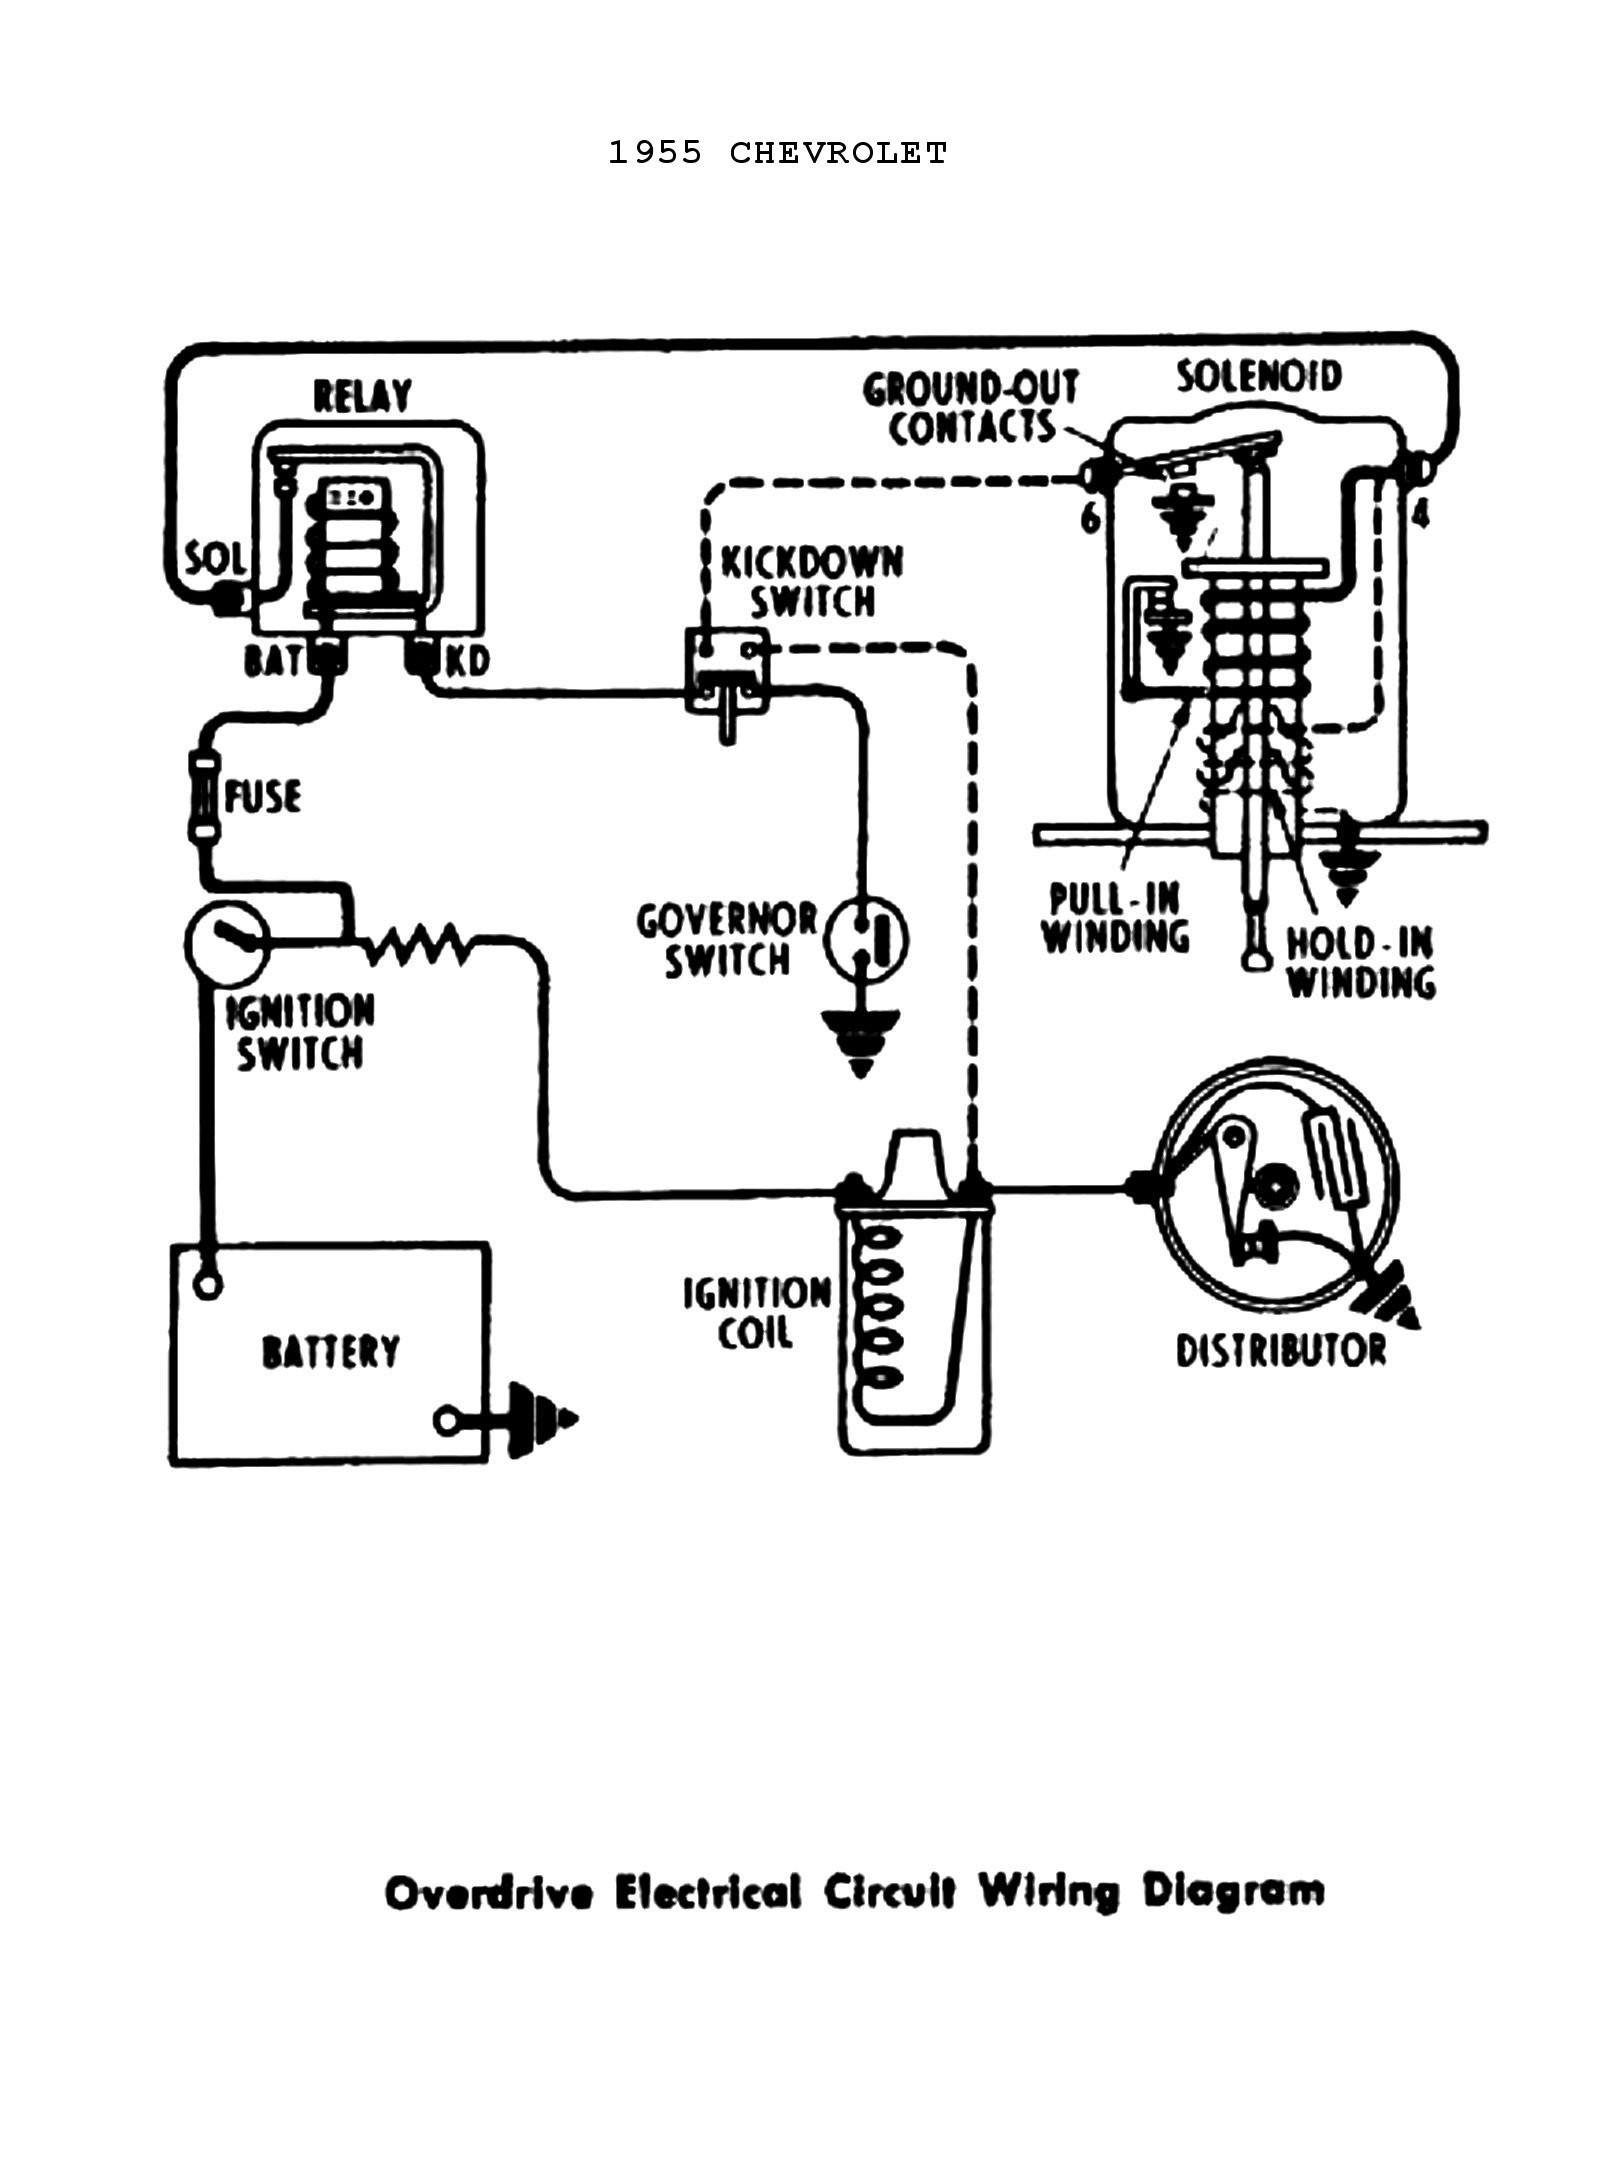 Farmall A Wiring Diagram Overdrive Transmission Wiring Diagram 1965 Vw Van Wiring Diagram Of Farmall A Wiring Diagram